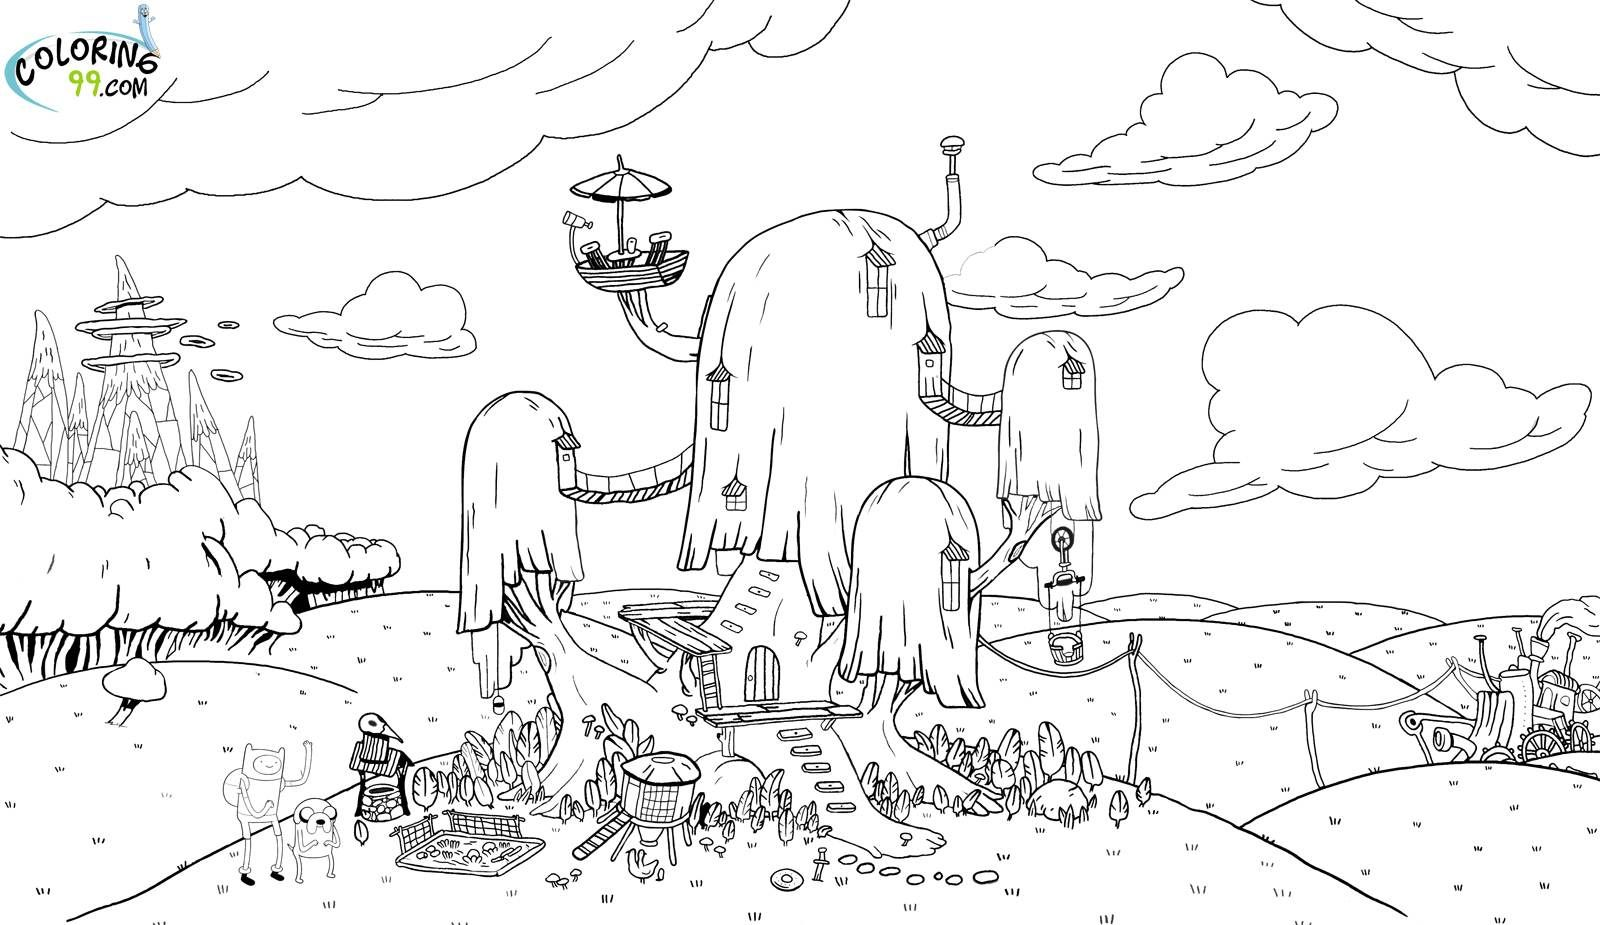 Pora Na Przygode Kolorowanki Adventure Time Coloring Pages Coloring Books Coloring Pages